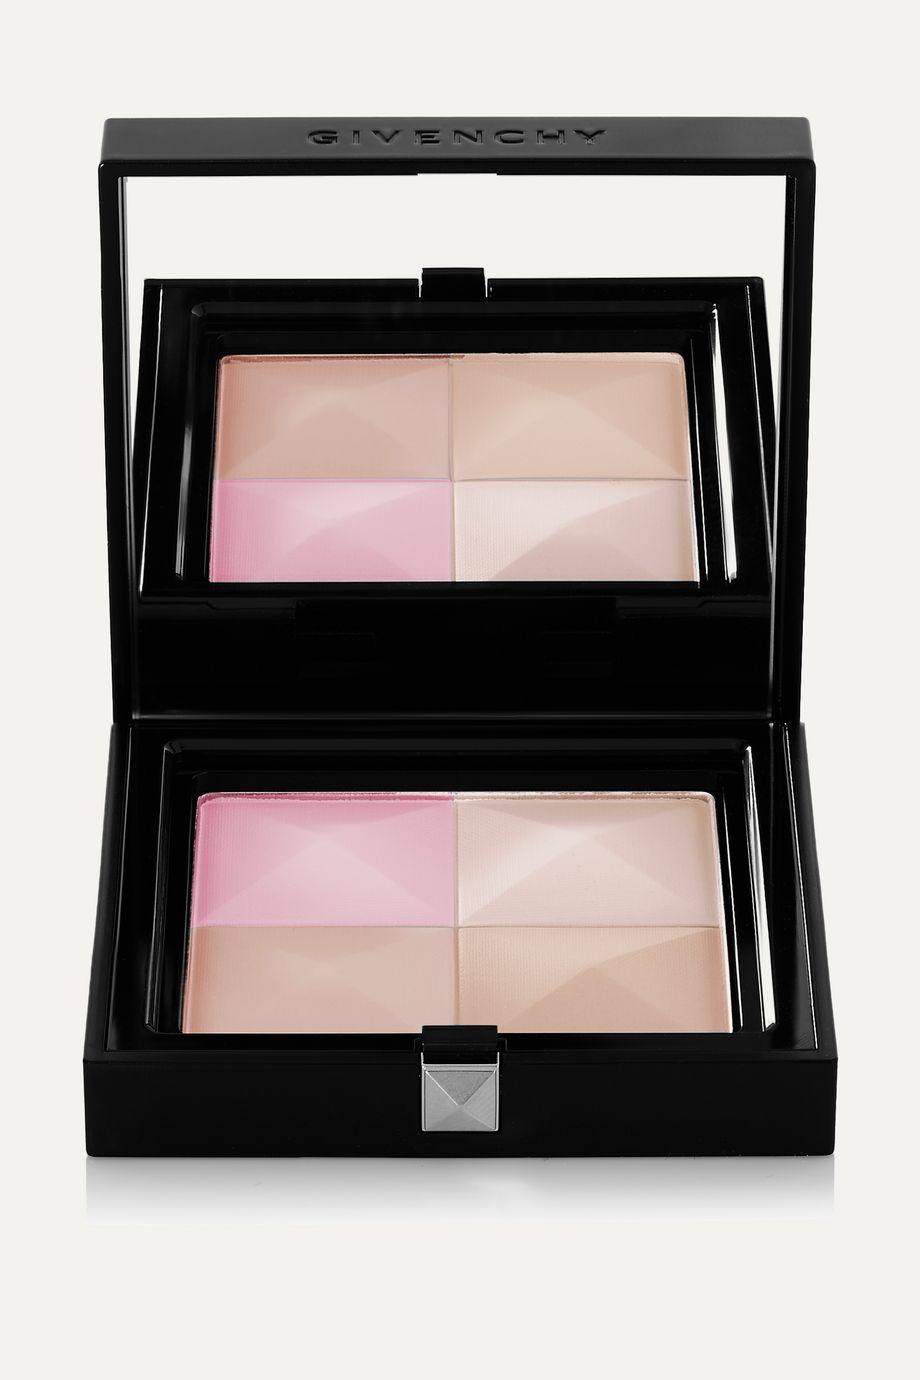 Givenchy Beauty Prisme Visage - Dentelle Beige No.4